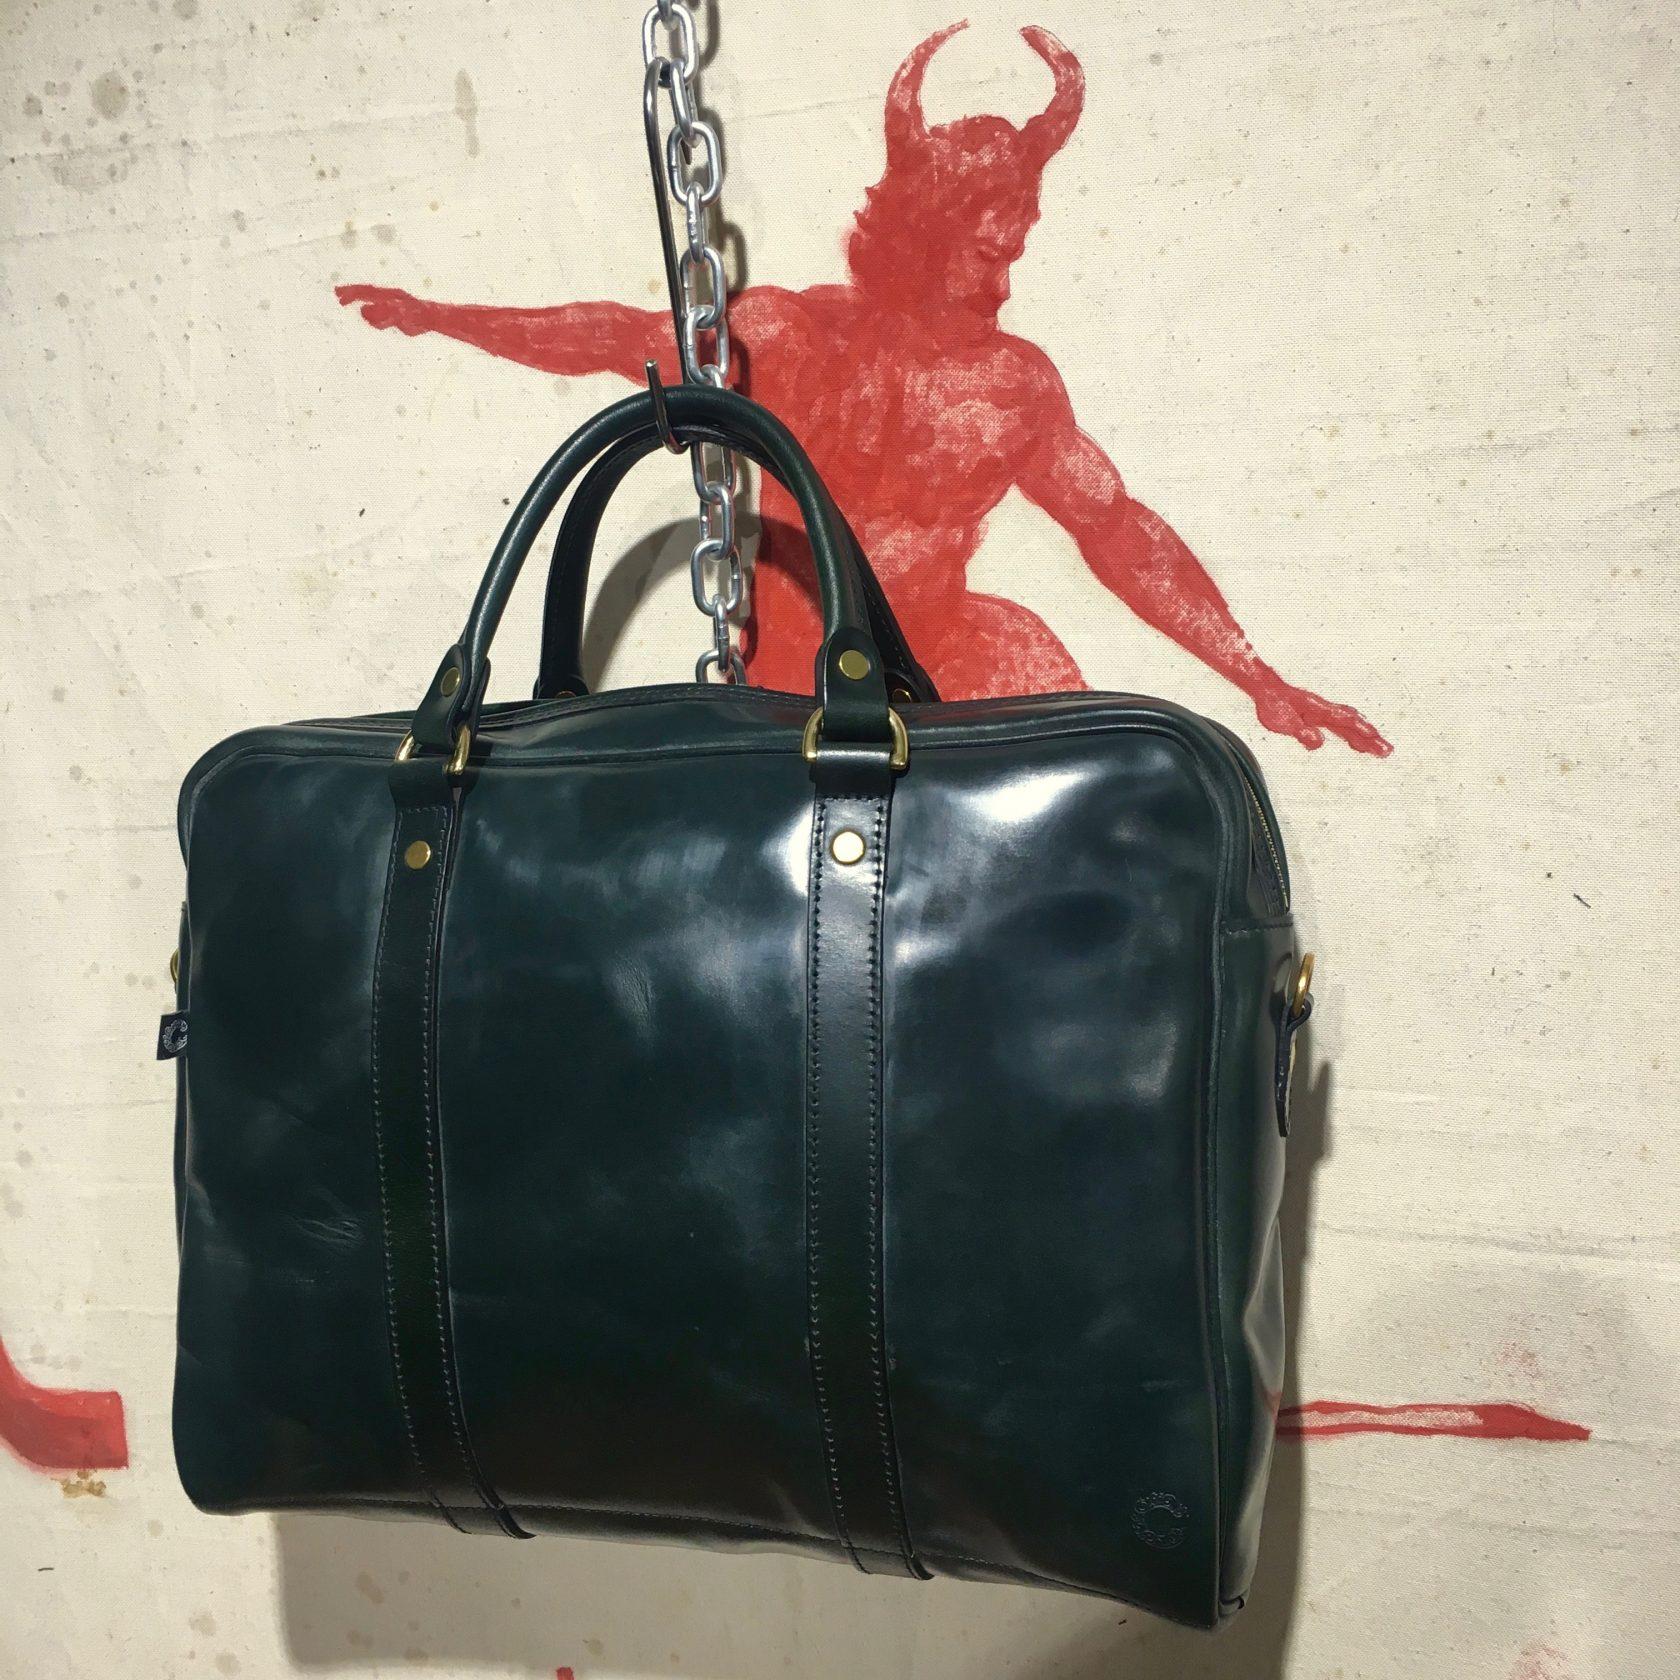 Croots malton bridle leather laptop bag racing green